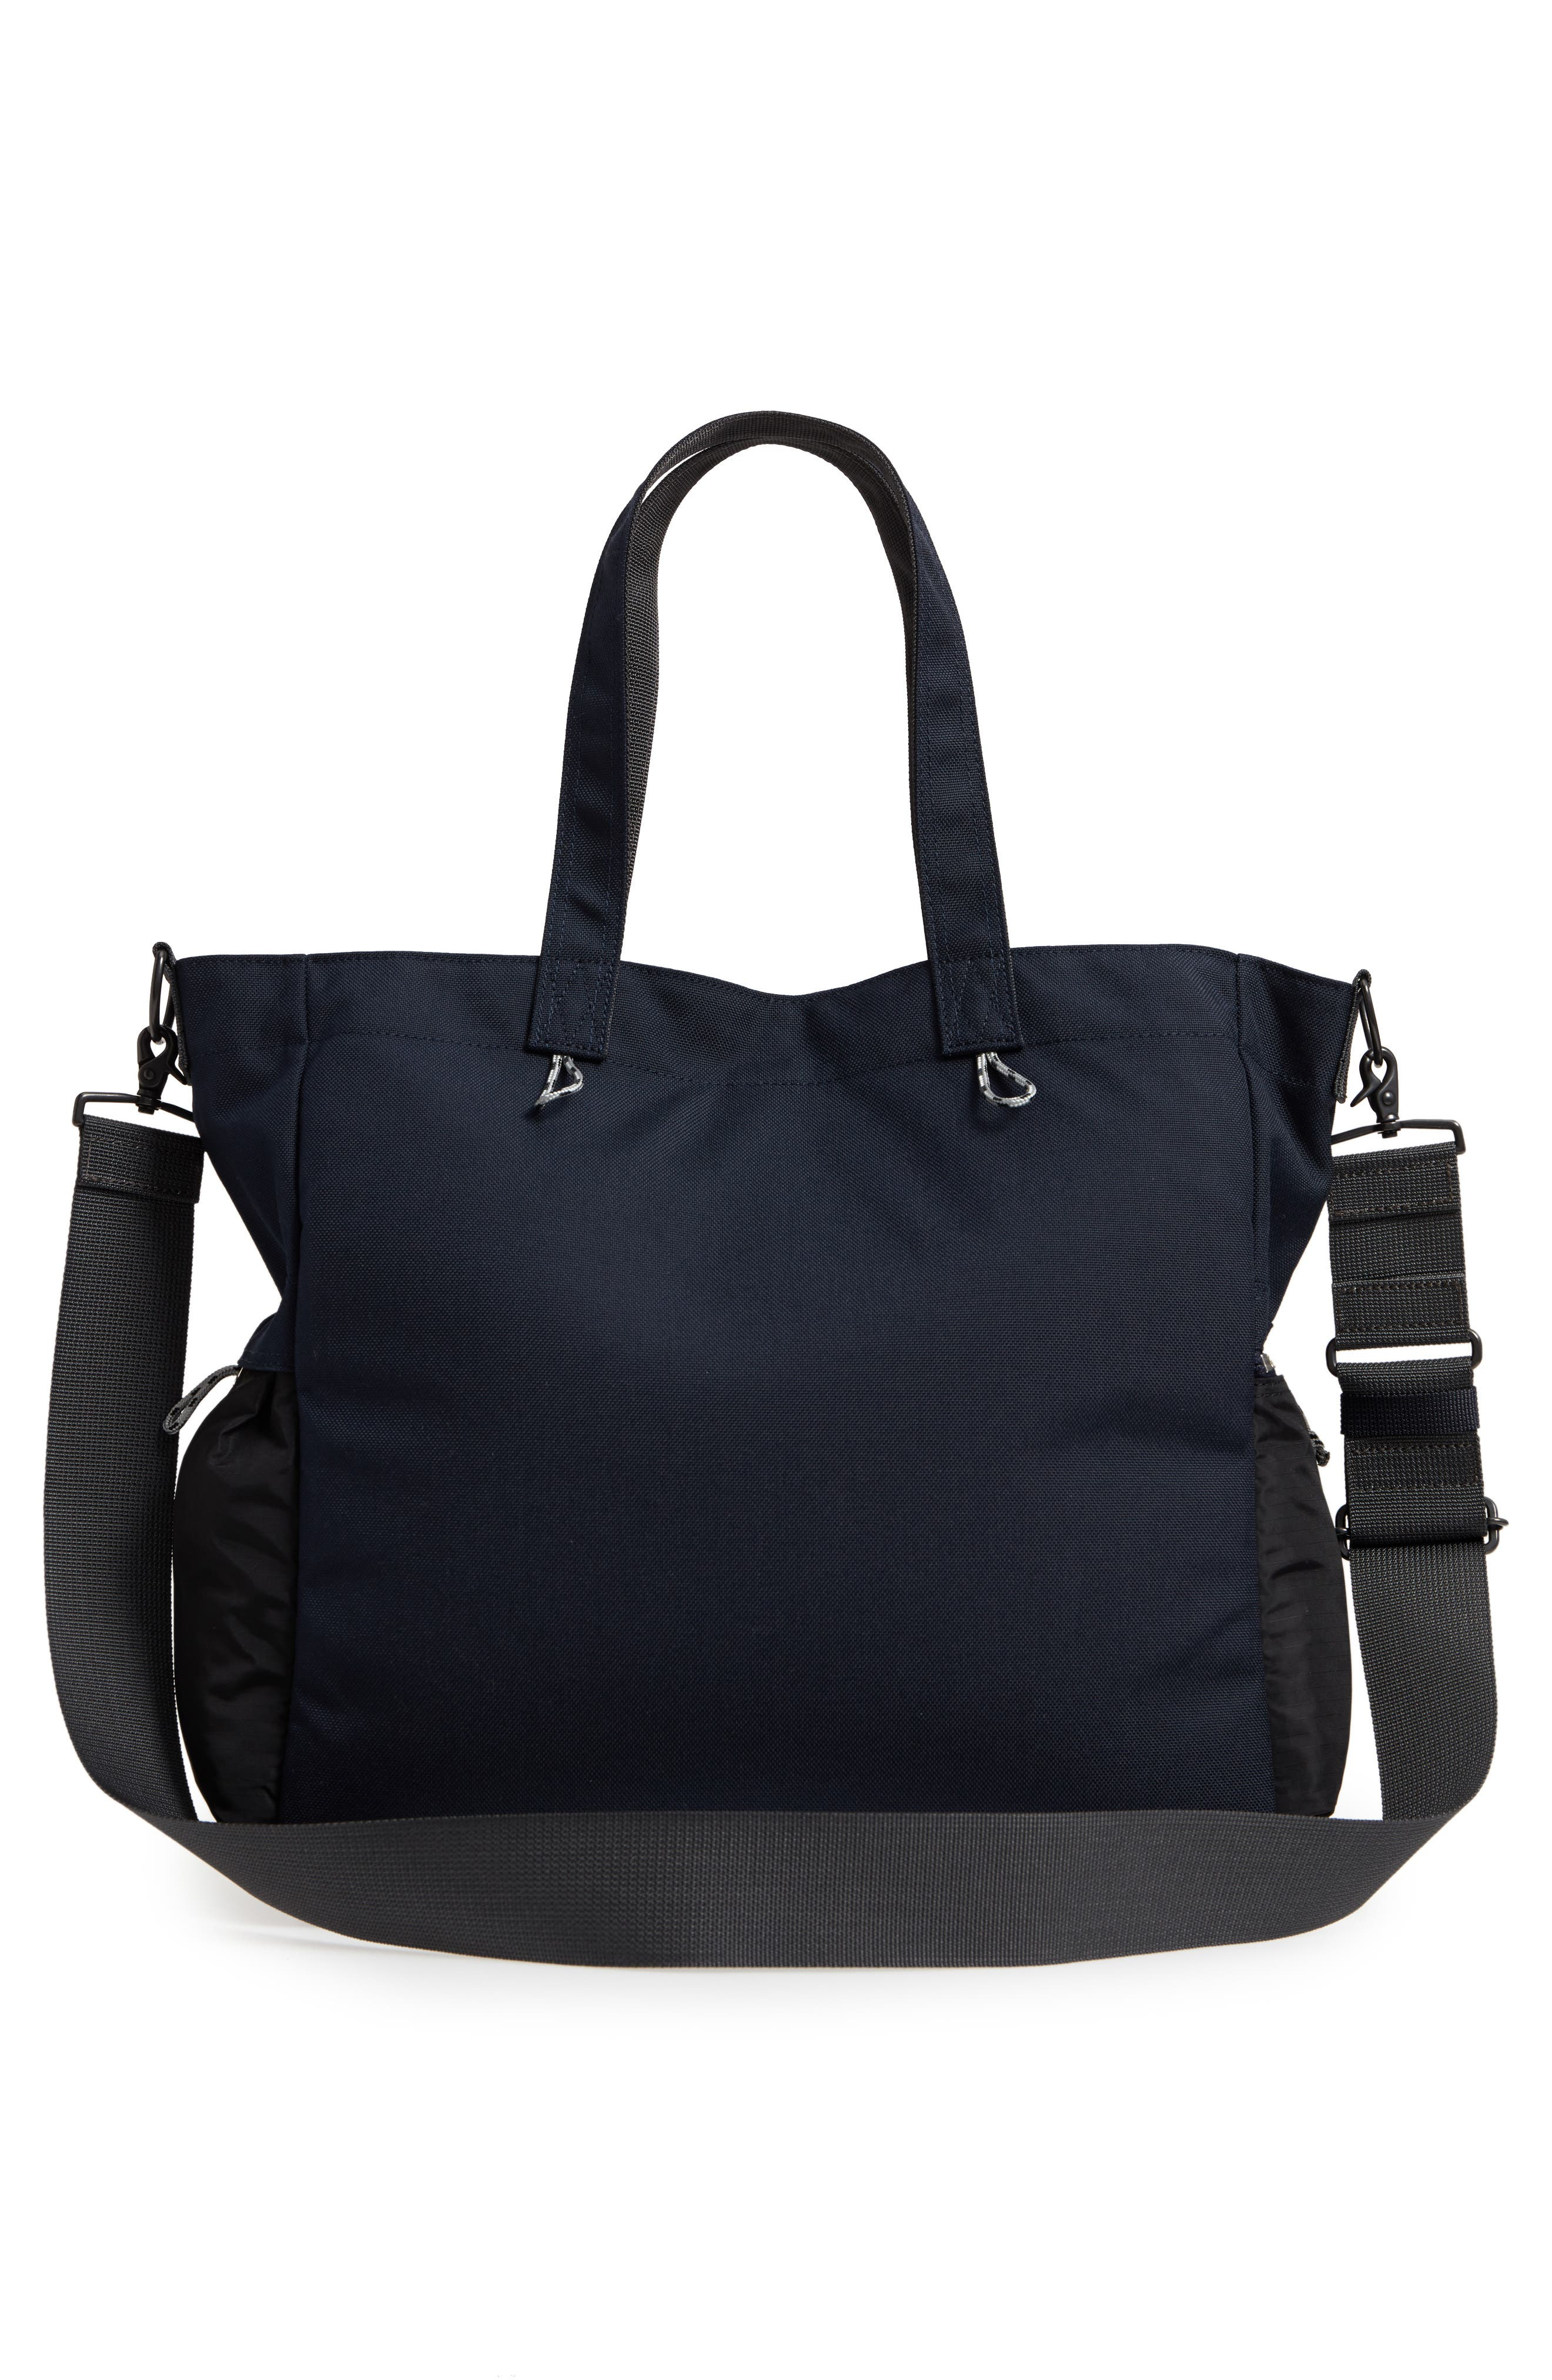 Porter-Yoshida & Co. Hype Tote Bag,                             Alternate thumbnail 3, color,                             Navy/ Black